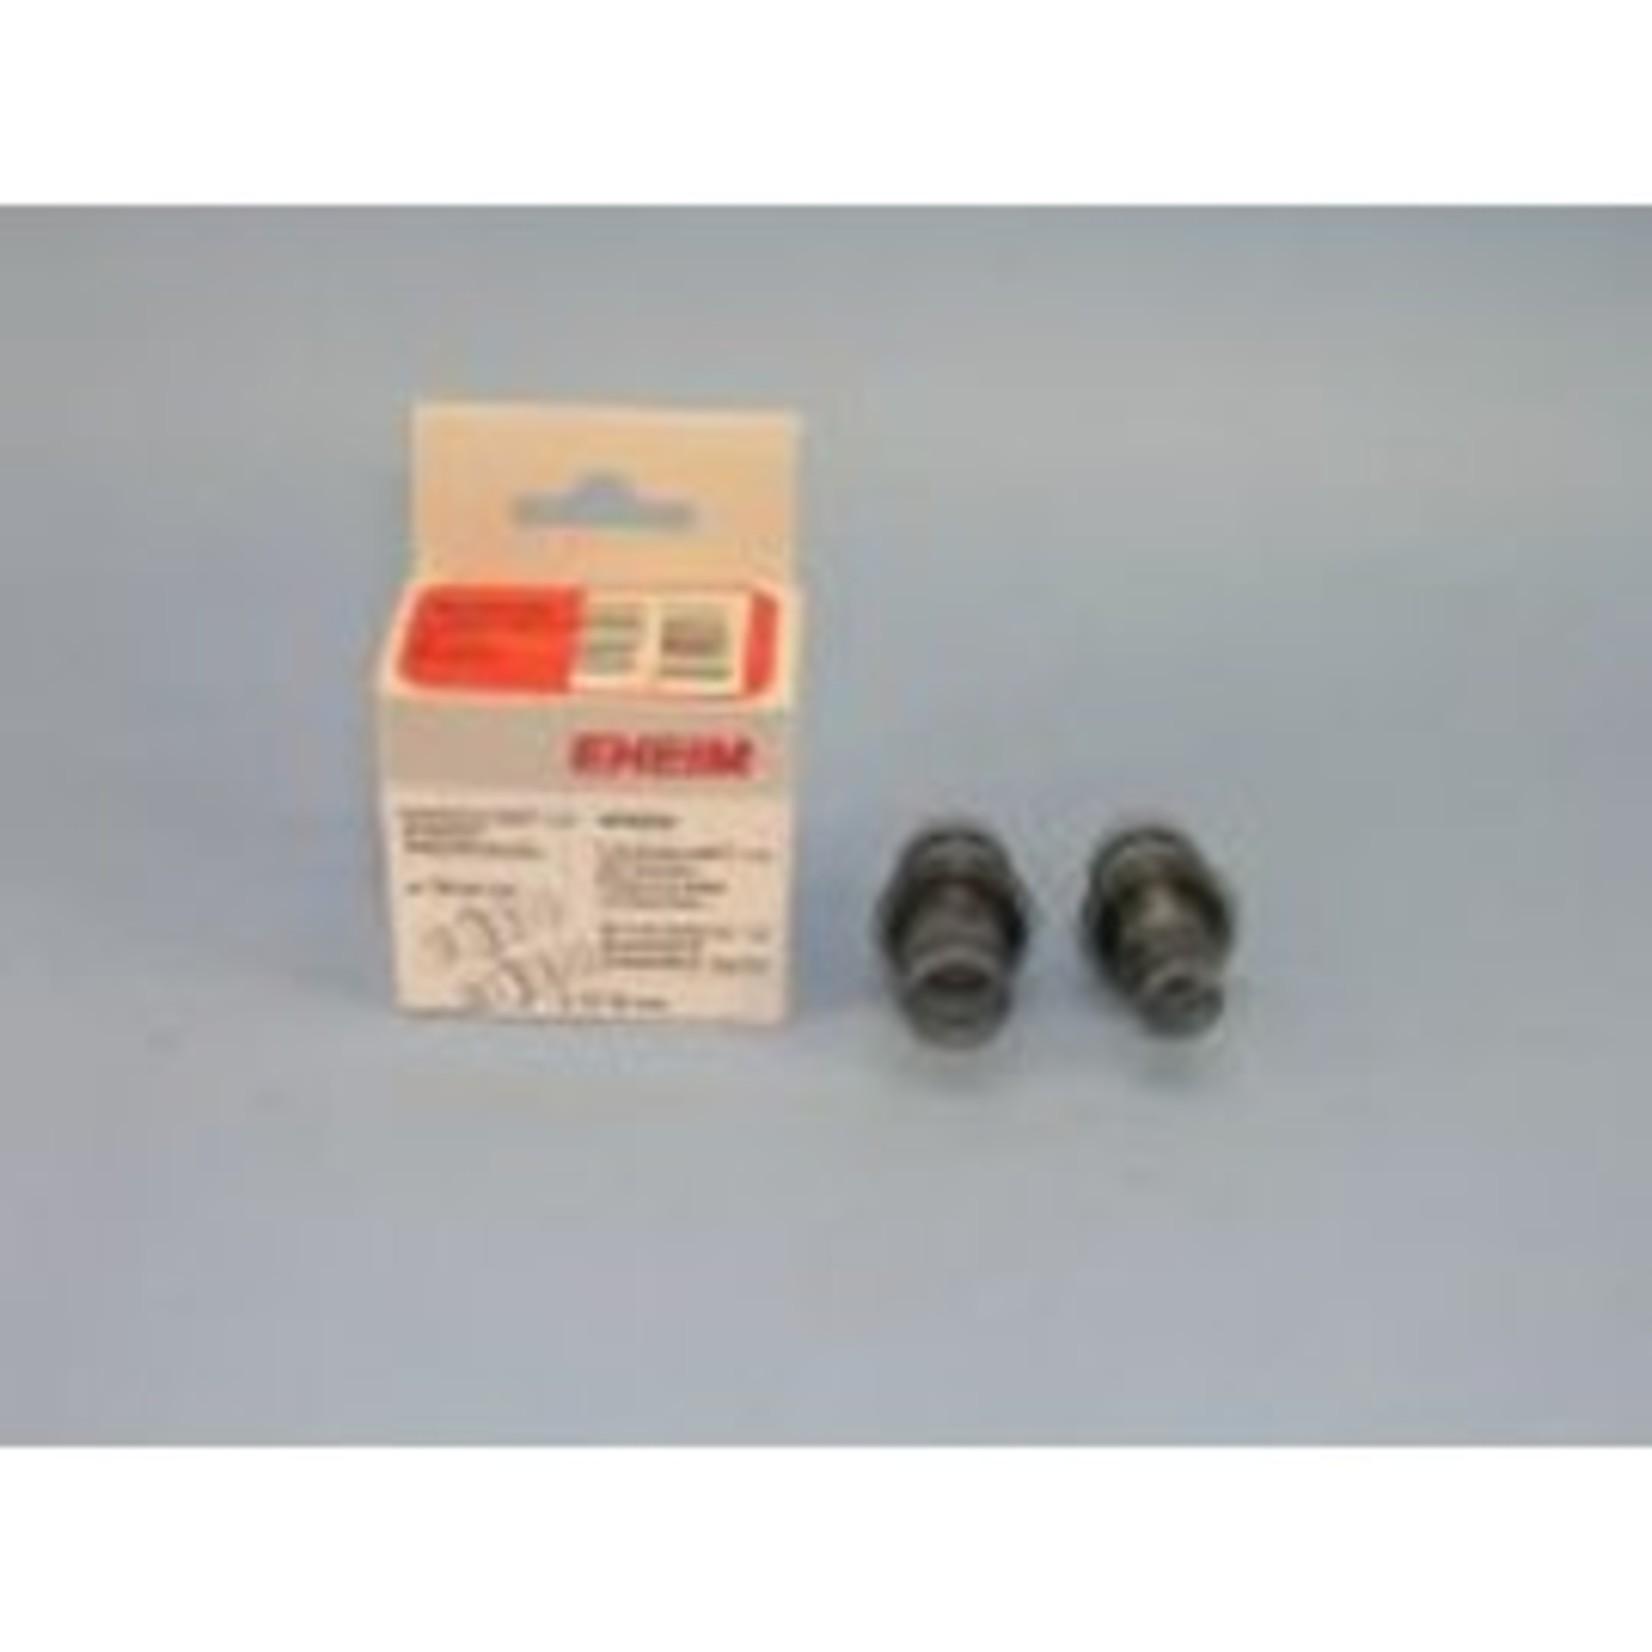 Eheim Adaptateur tuyaux 12-16 / 16-22mm